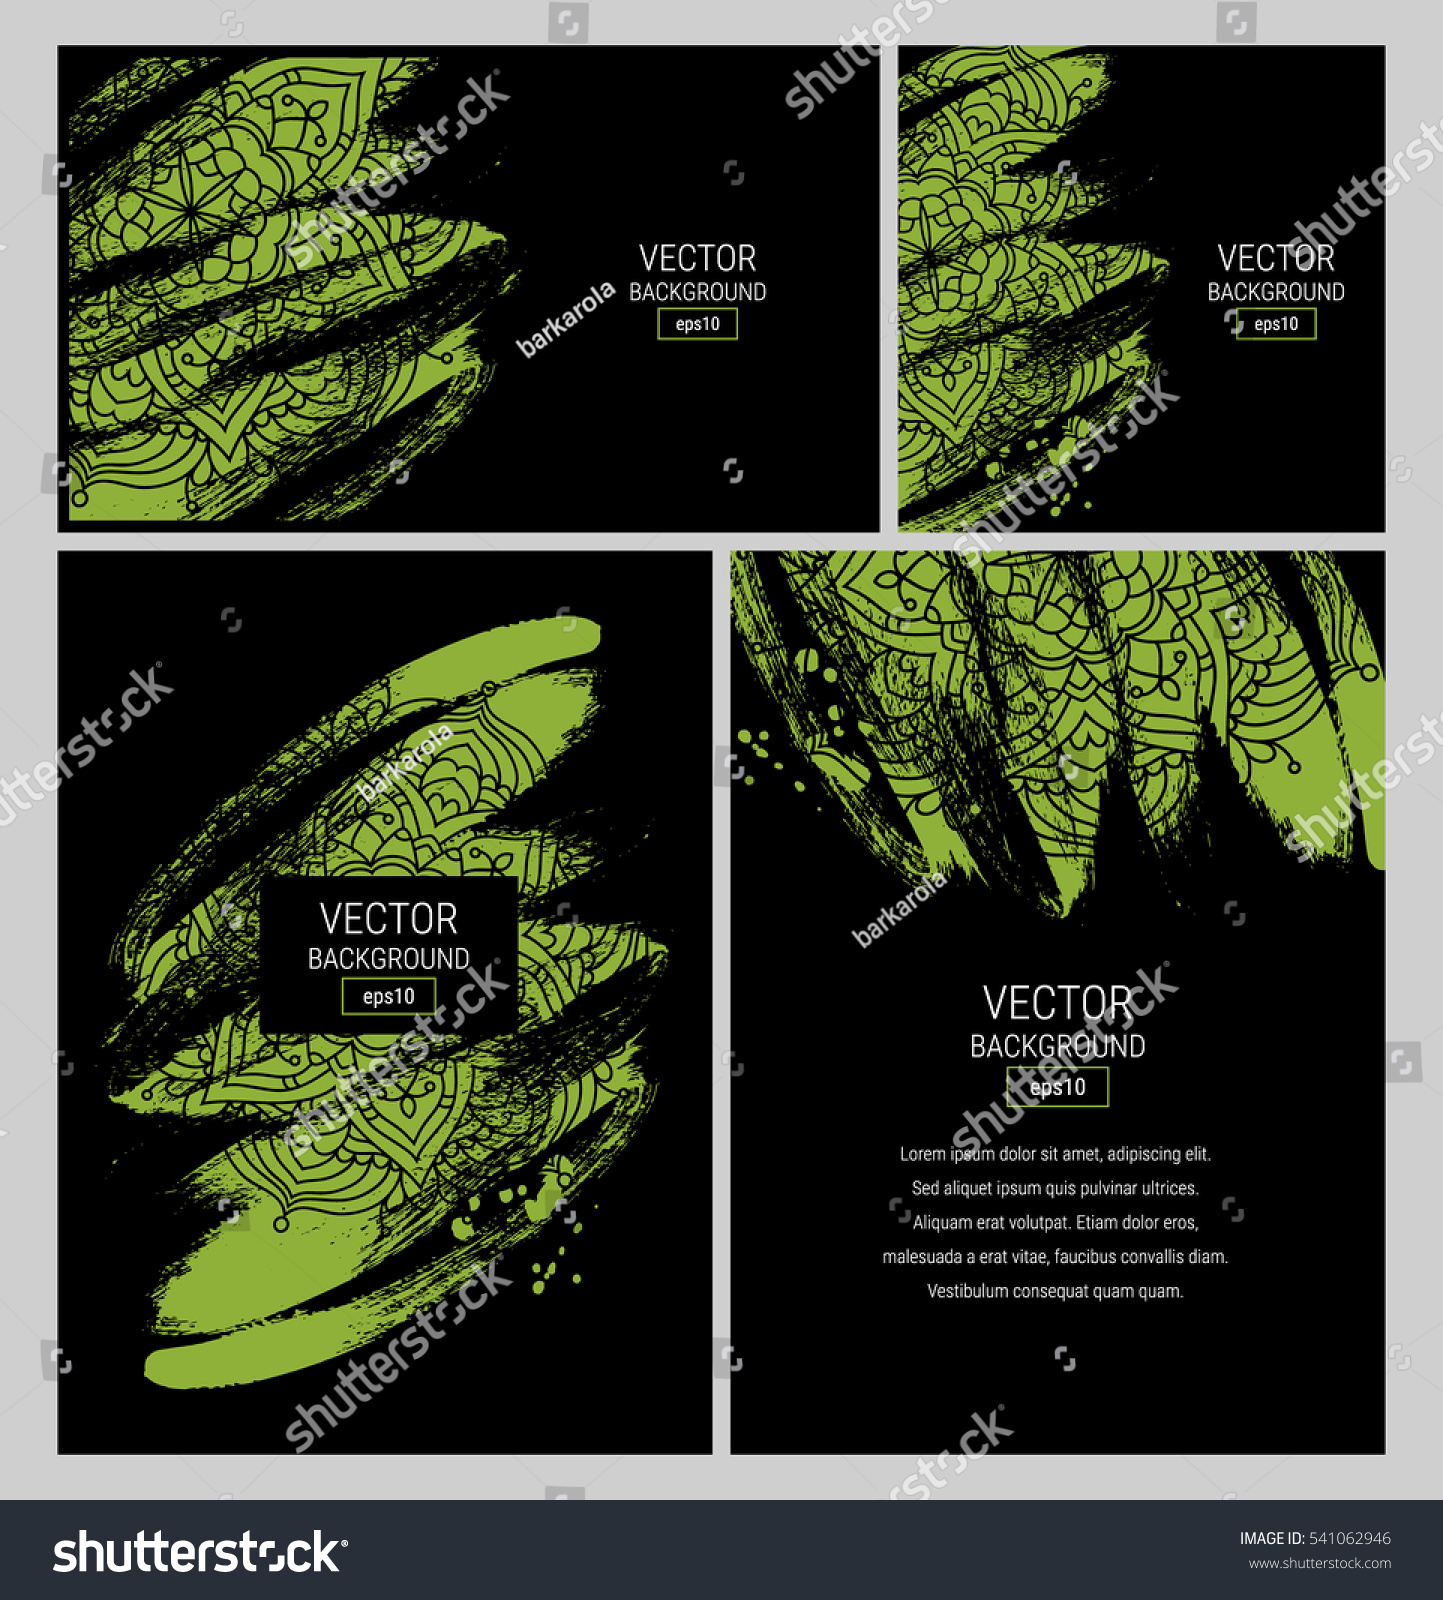 vector set business card templates mandala stock vector 541062946 vector set of business card templates mandala pattern invitation template abstract design